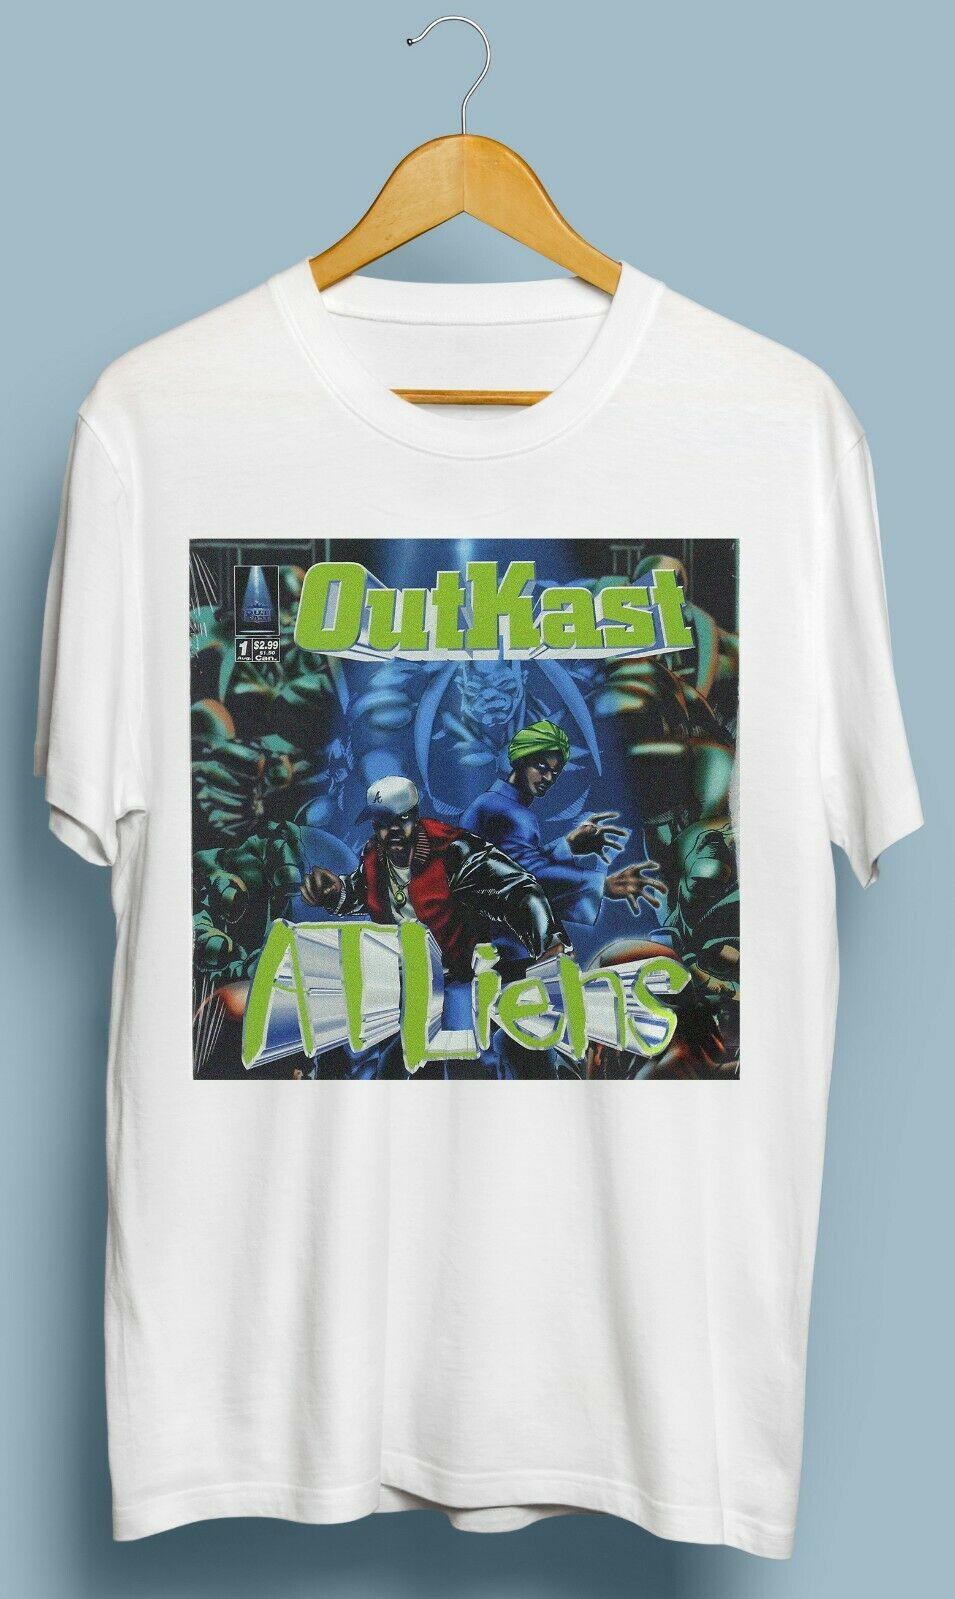 Vintage Outkast Atliens camiseta de Hip-Hop 2019 Unisex Tee